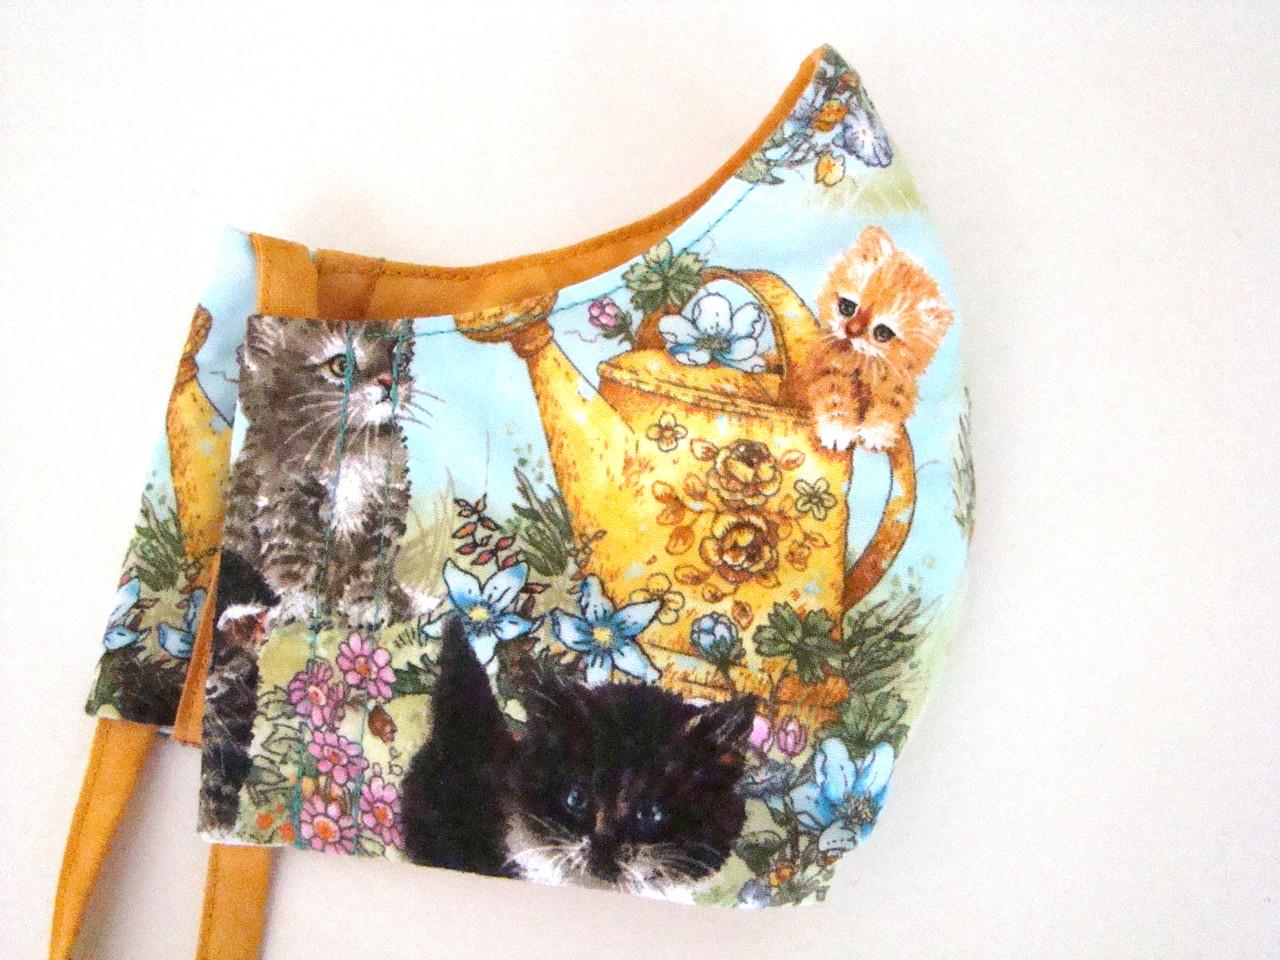 Kitty Cats and Flower Pots (FM-KITTY-FLOWERPOTS)